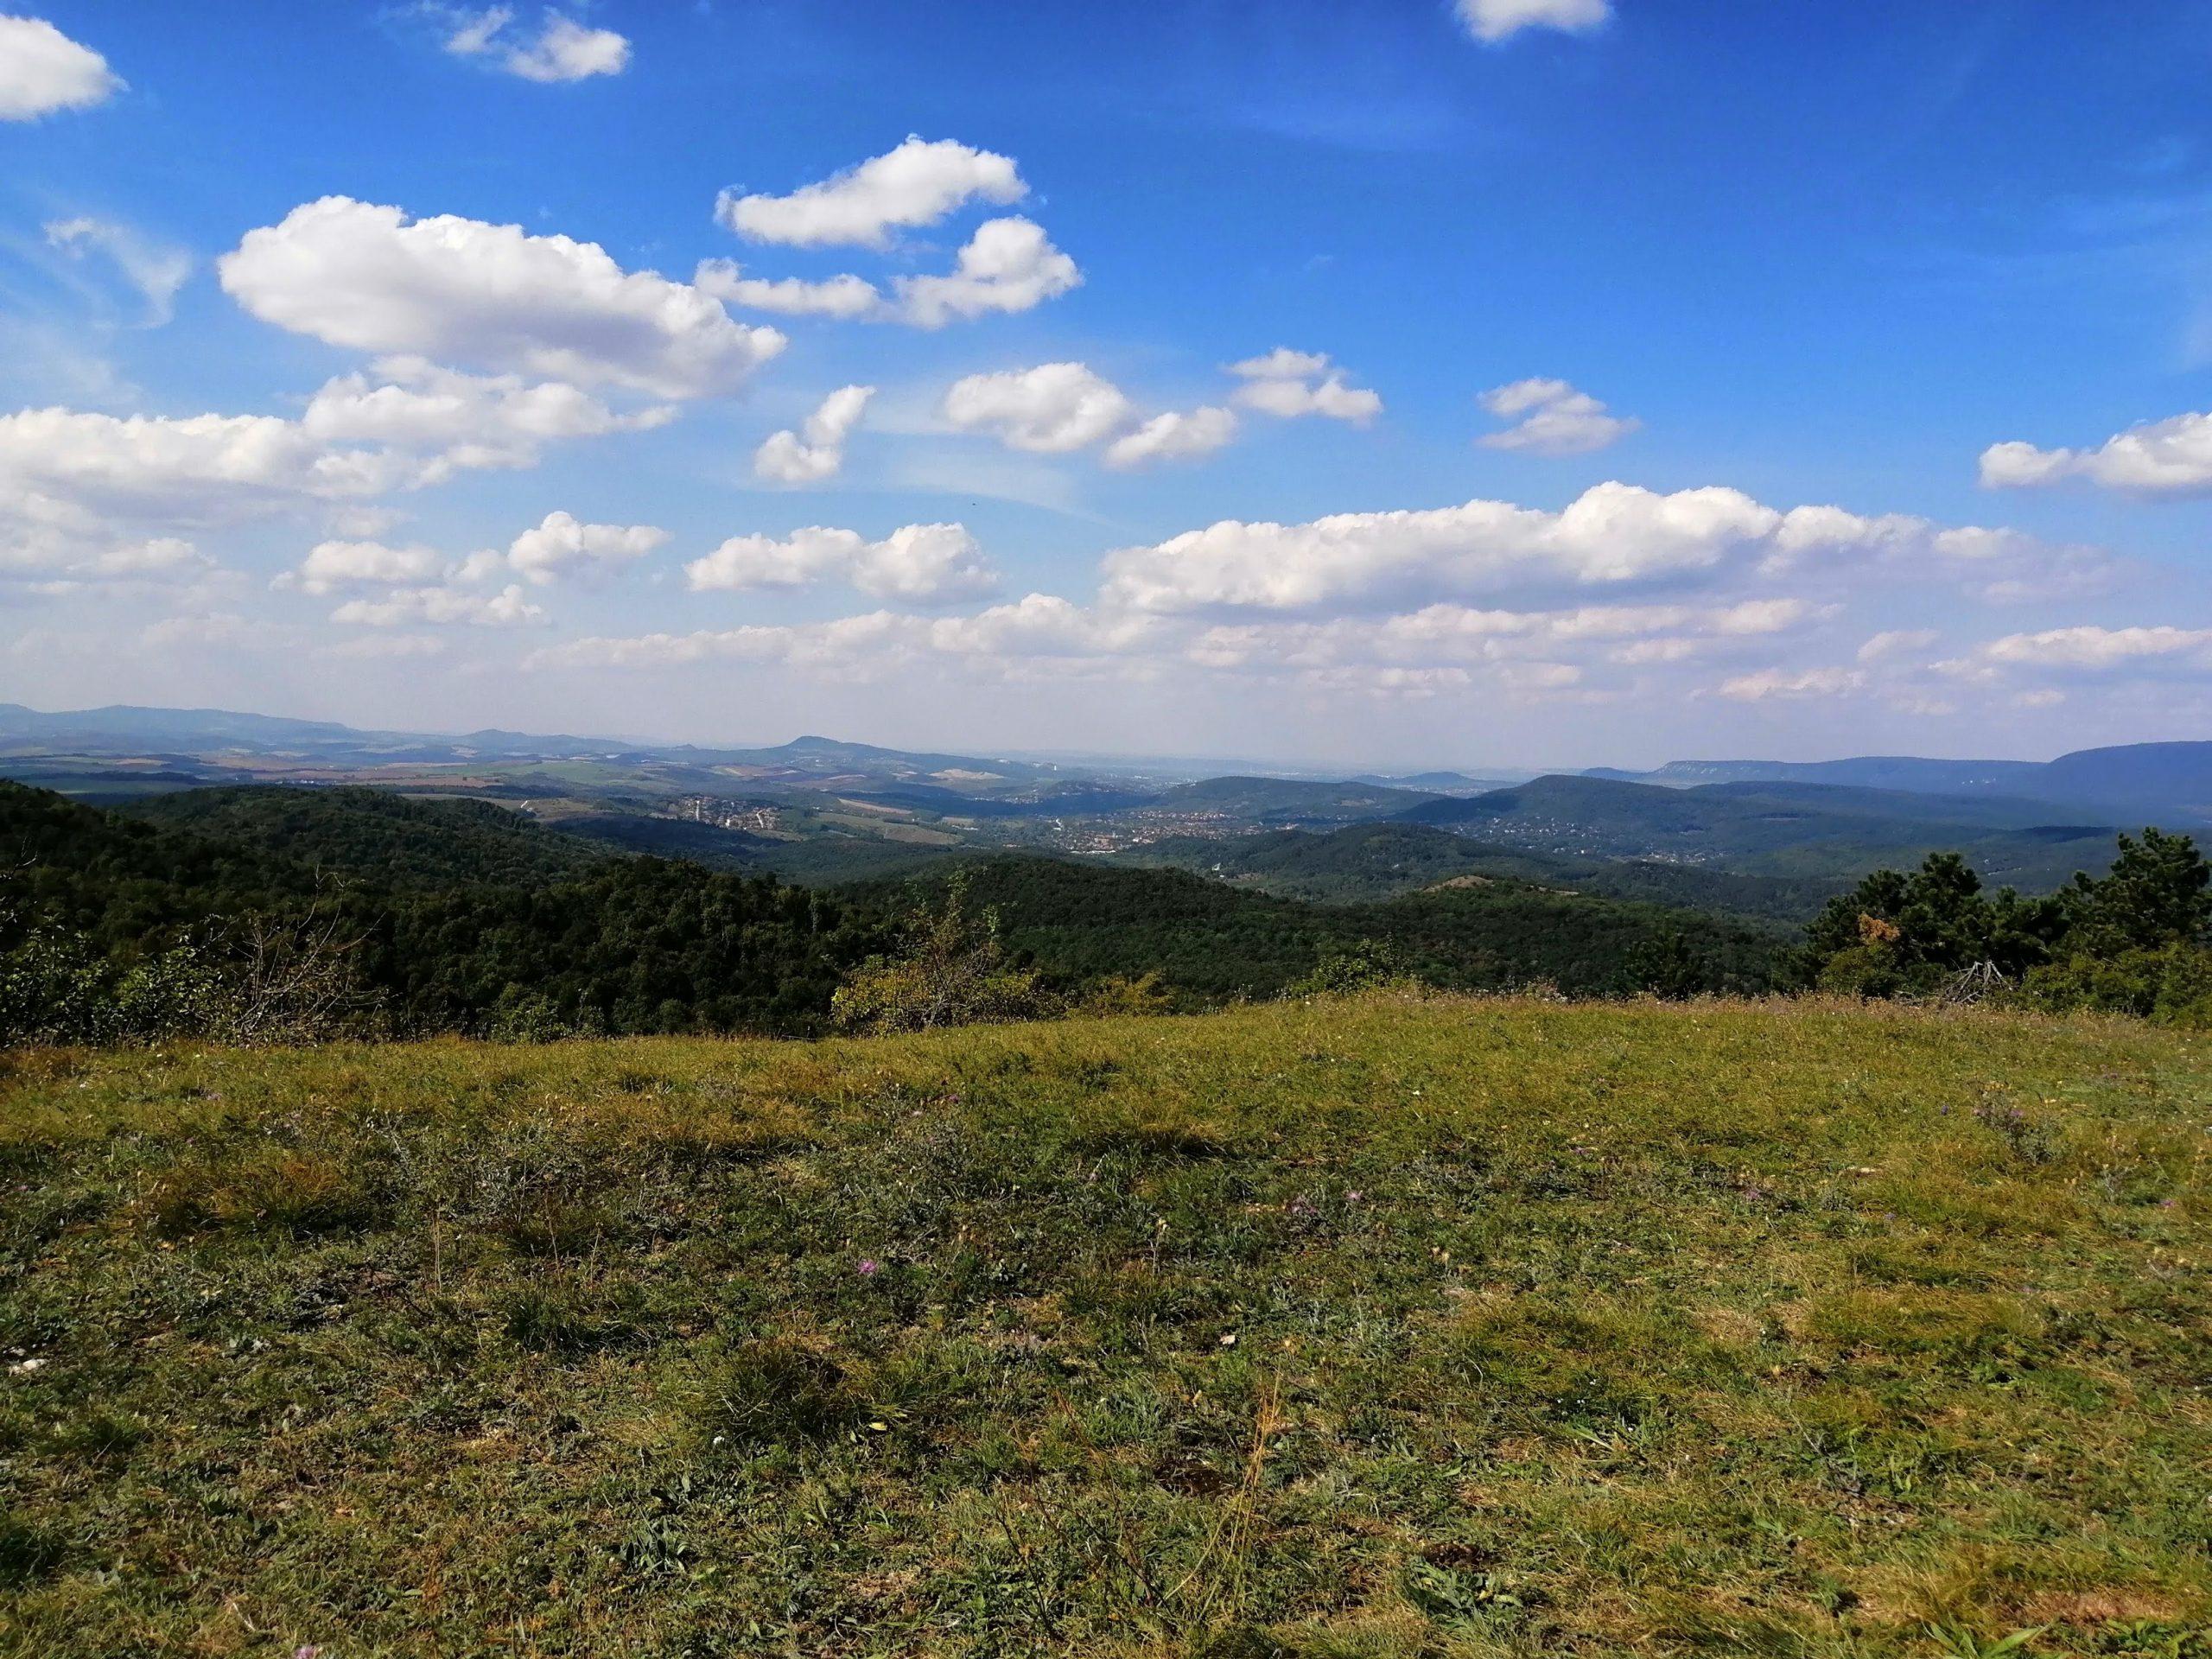 Blue Trail mountain view